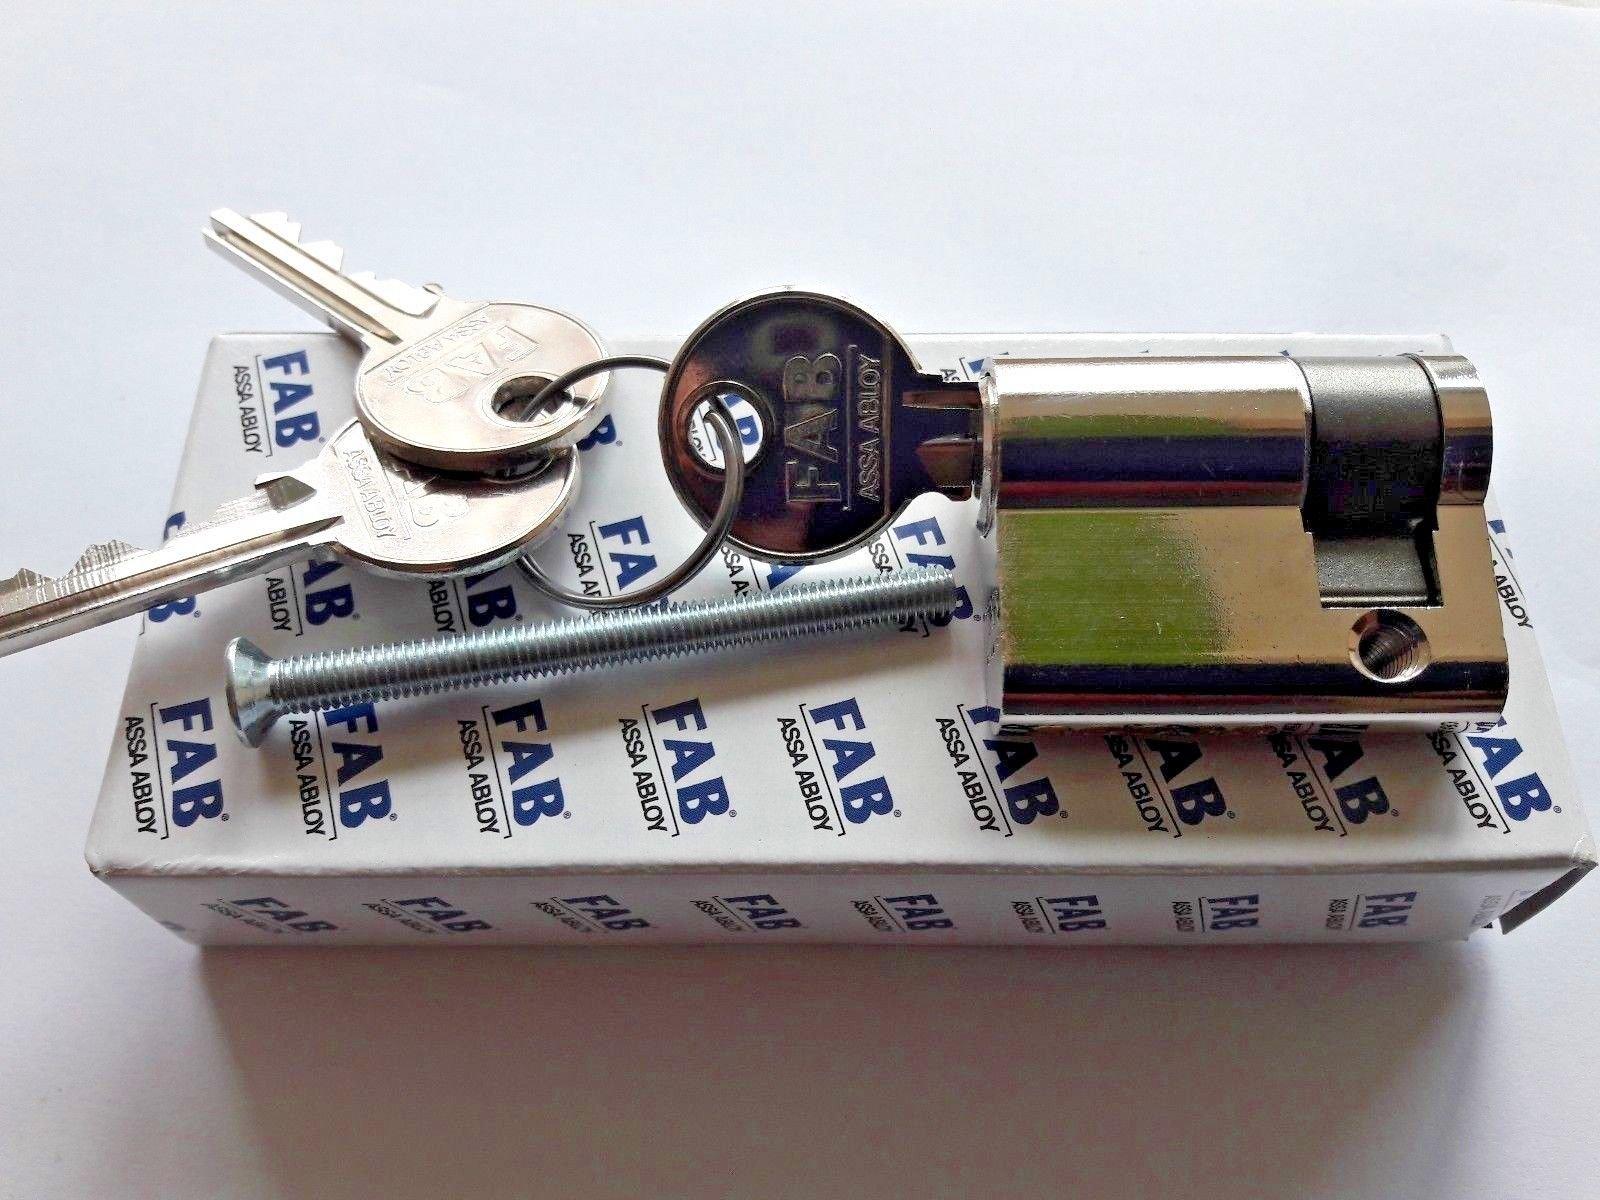 FAB 50 Assa Abloy (Czech Republic)/Euro Profile Cylinder Lock With 3 keys/Color Nickel (30/10 Half Cylinder)